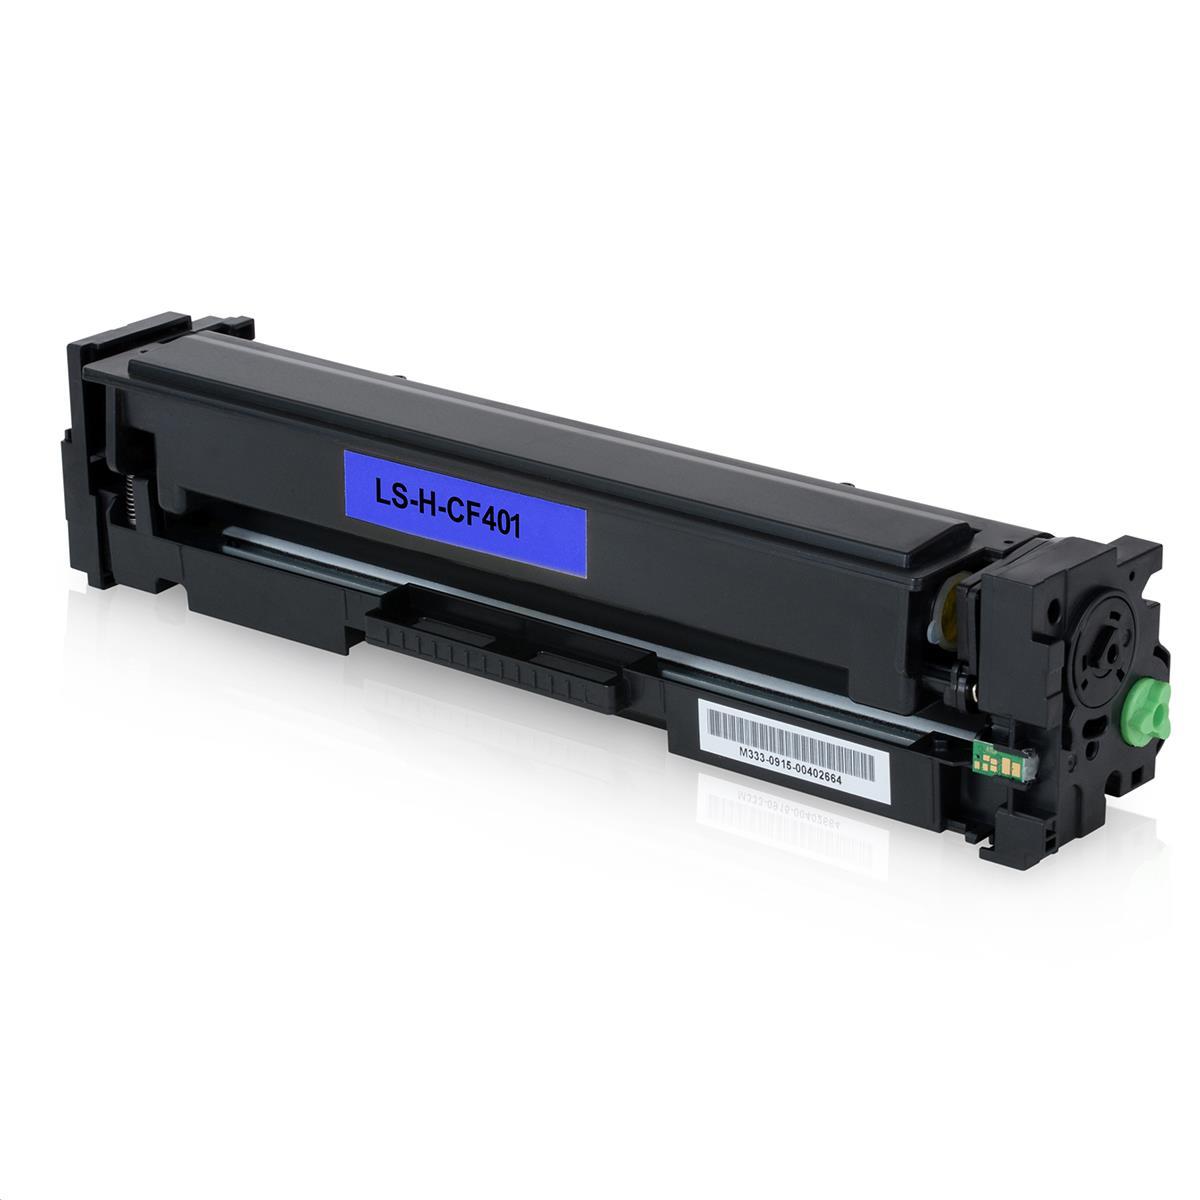 Toner HP CF401A 201A Azul Compatível| M252DW M277DW M252 M277 | Importado